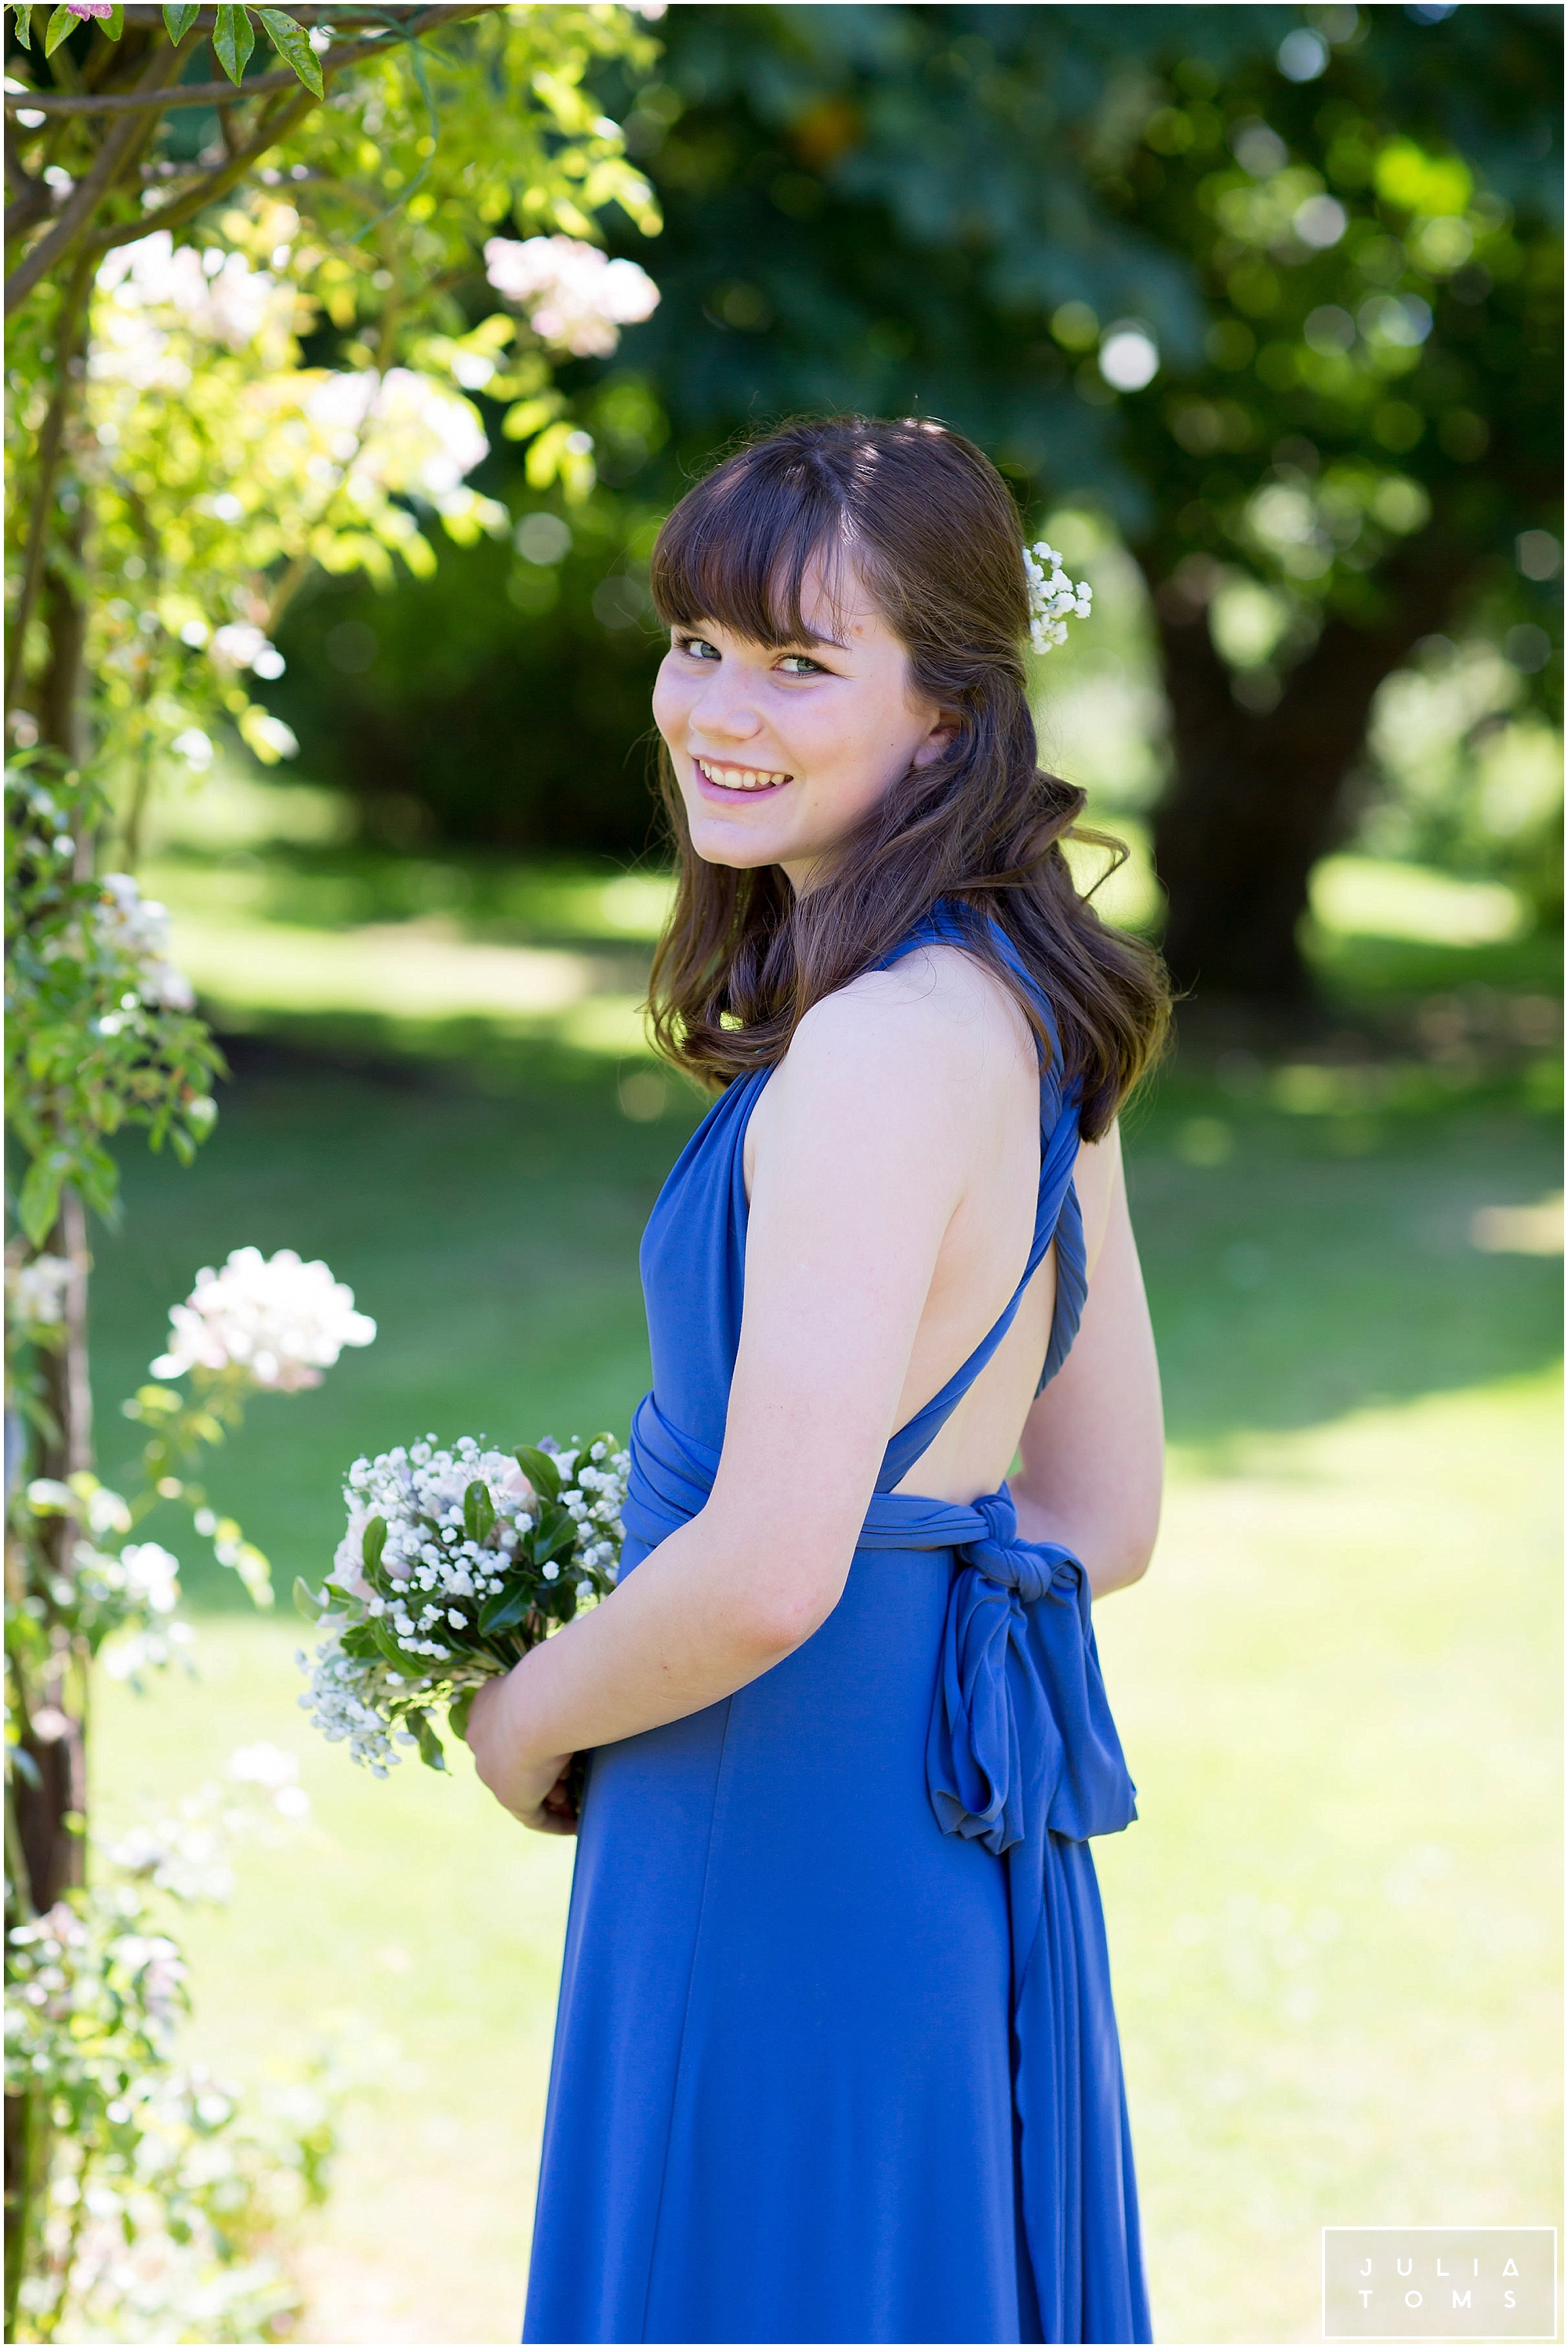 julia_toms_chichester_wedding_photographer_portsmouth_012.jpg